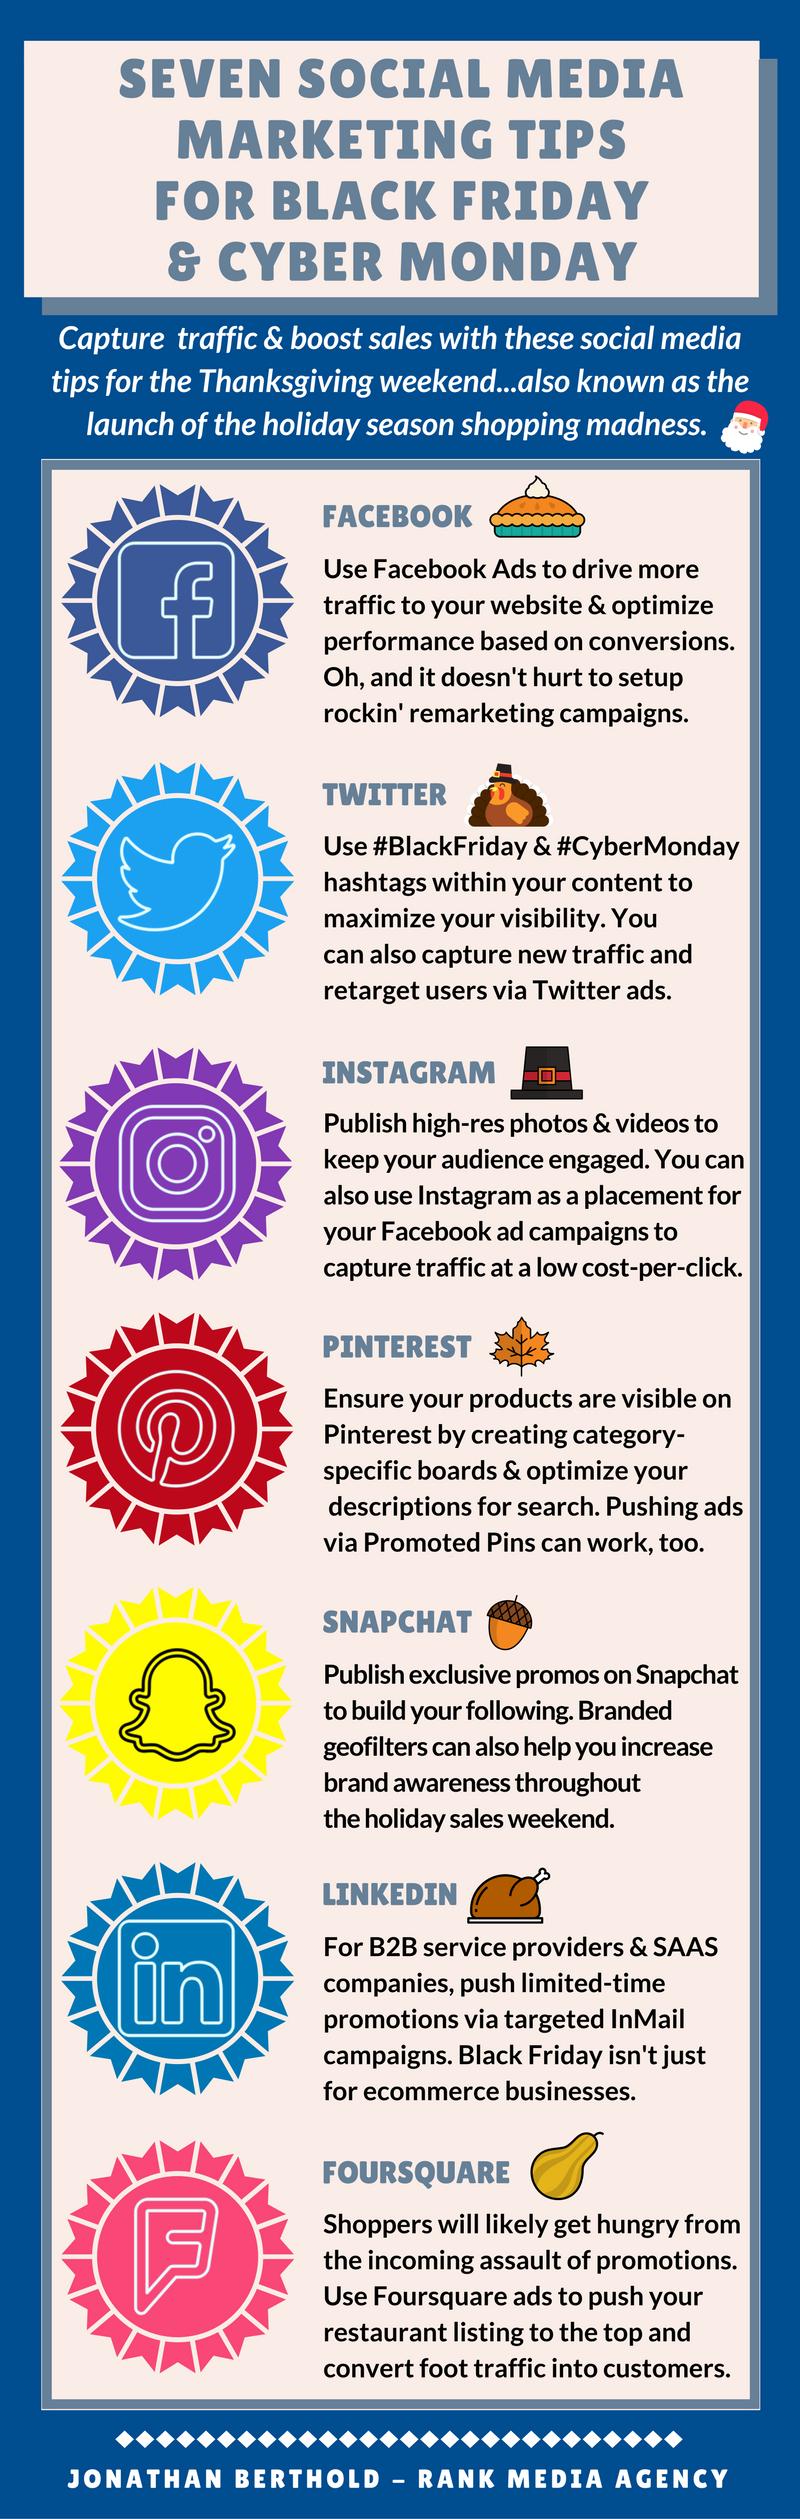 Seven Social Media Marketing Tips for Black Friday & Cyber Monday